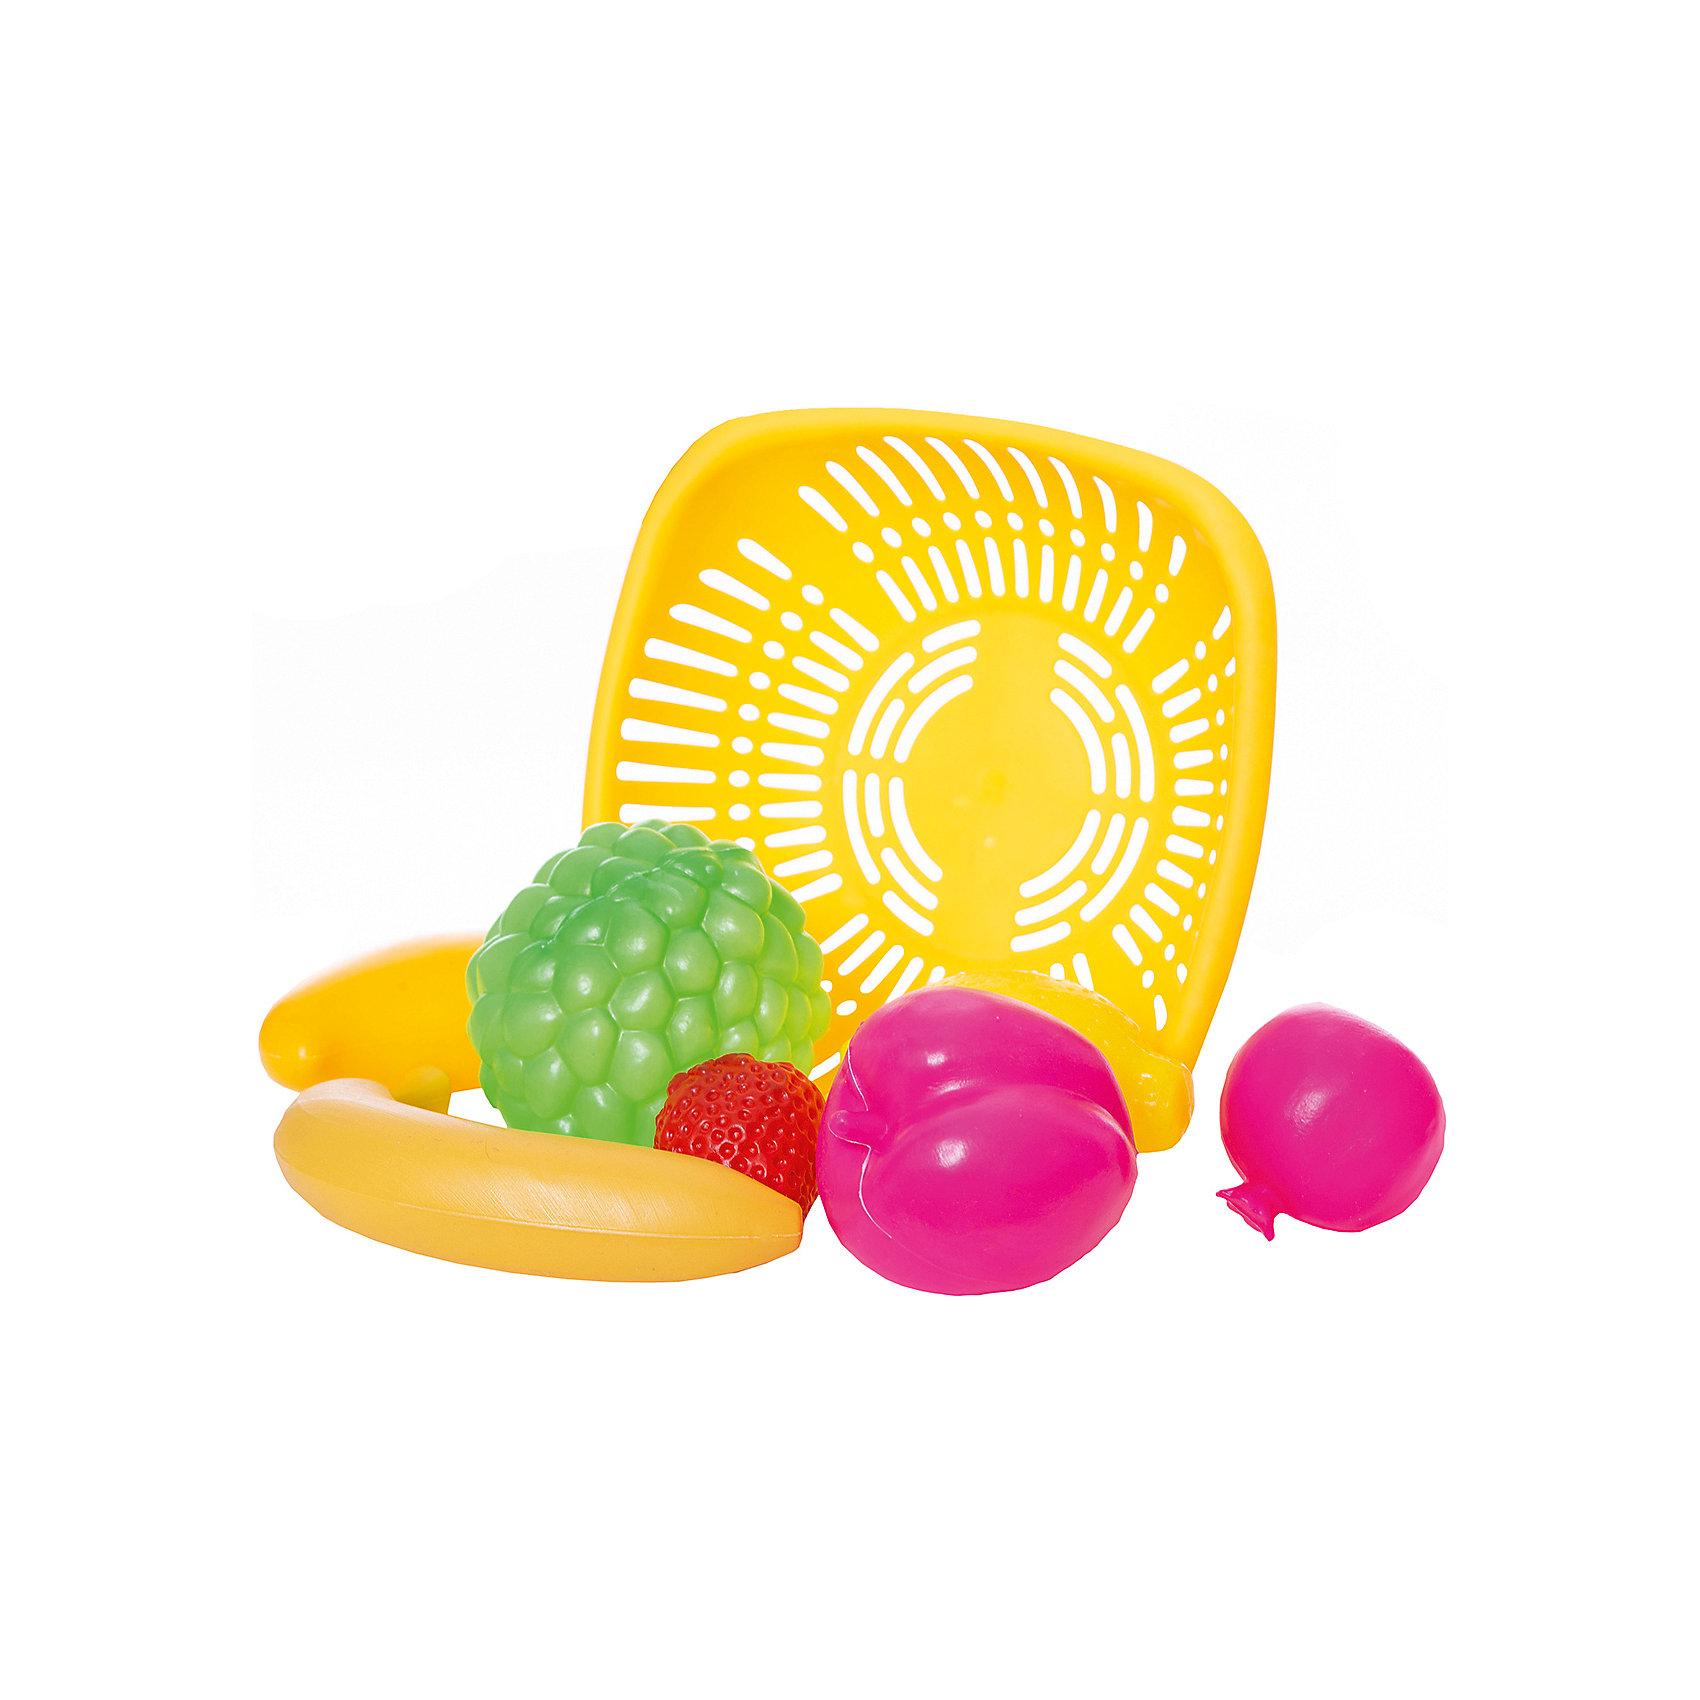 EstaBella Набор Овощи и фрукты, EstaBella игнатова а овощи и фрукты